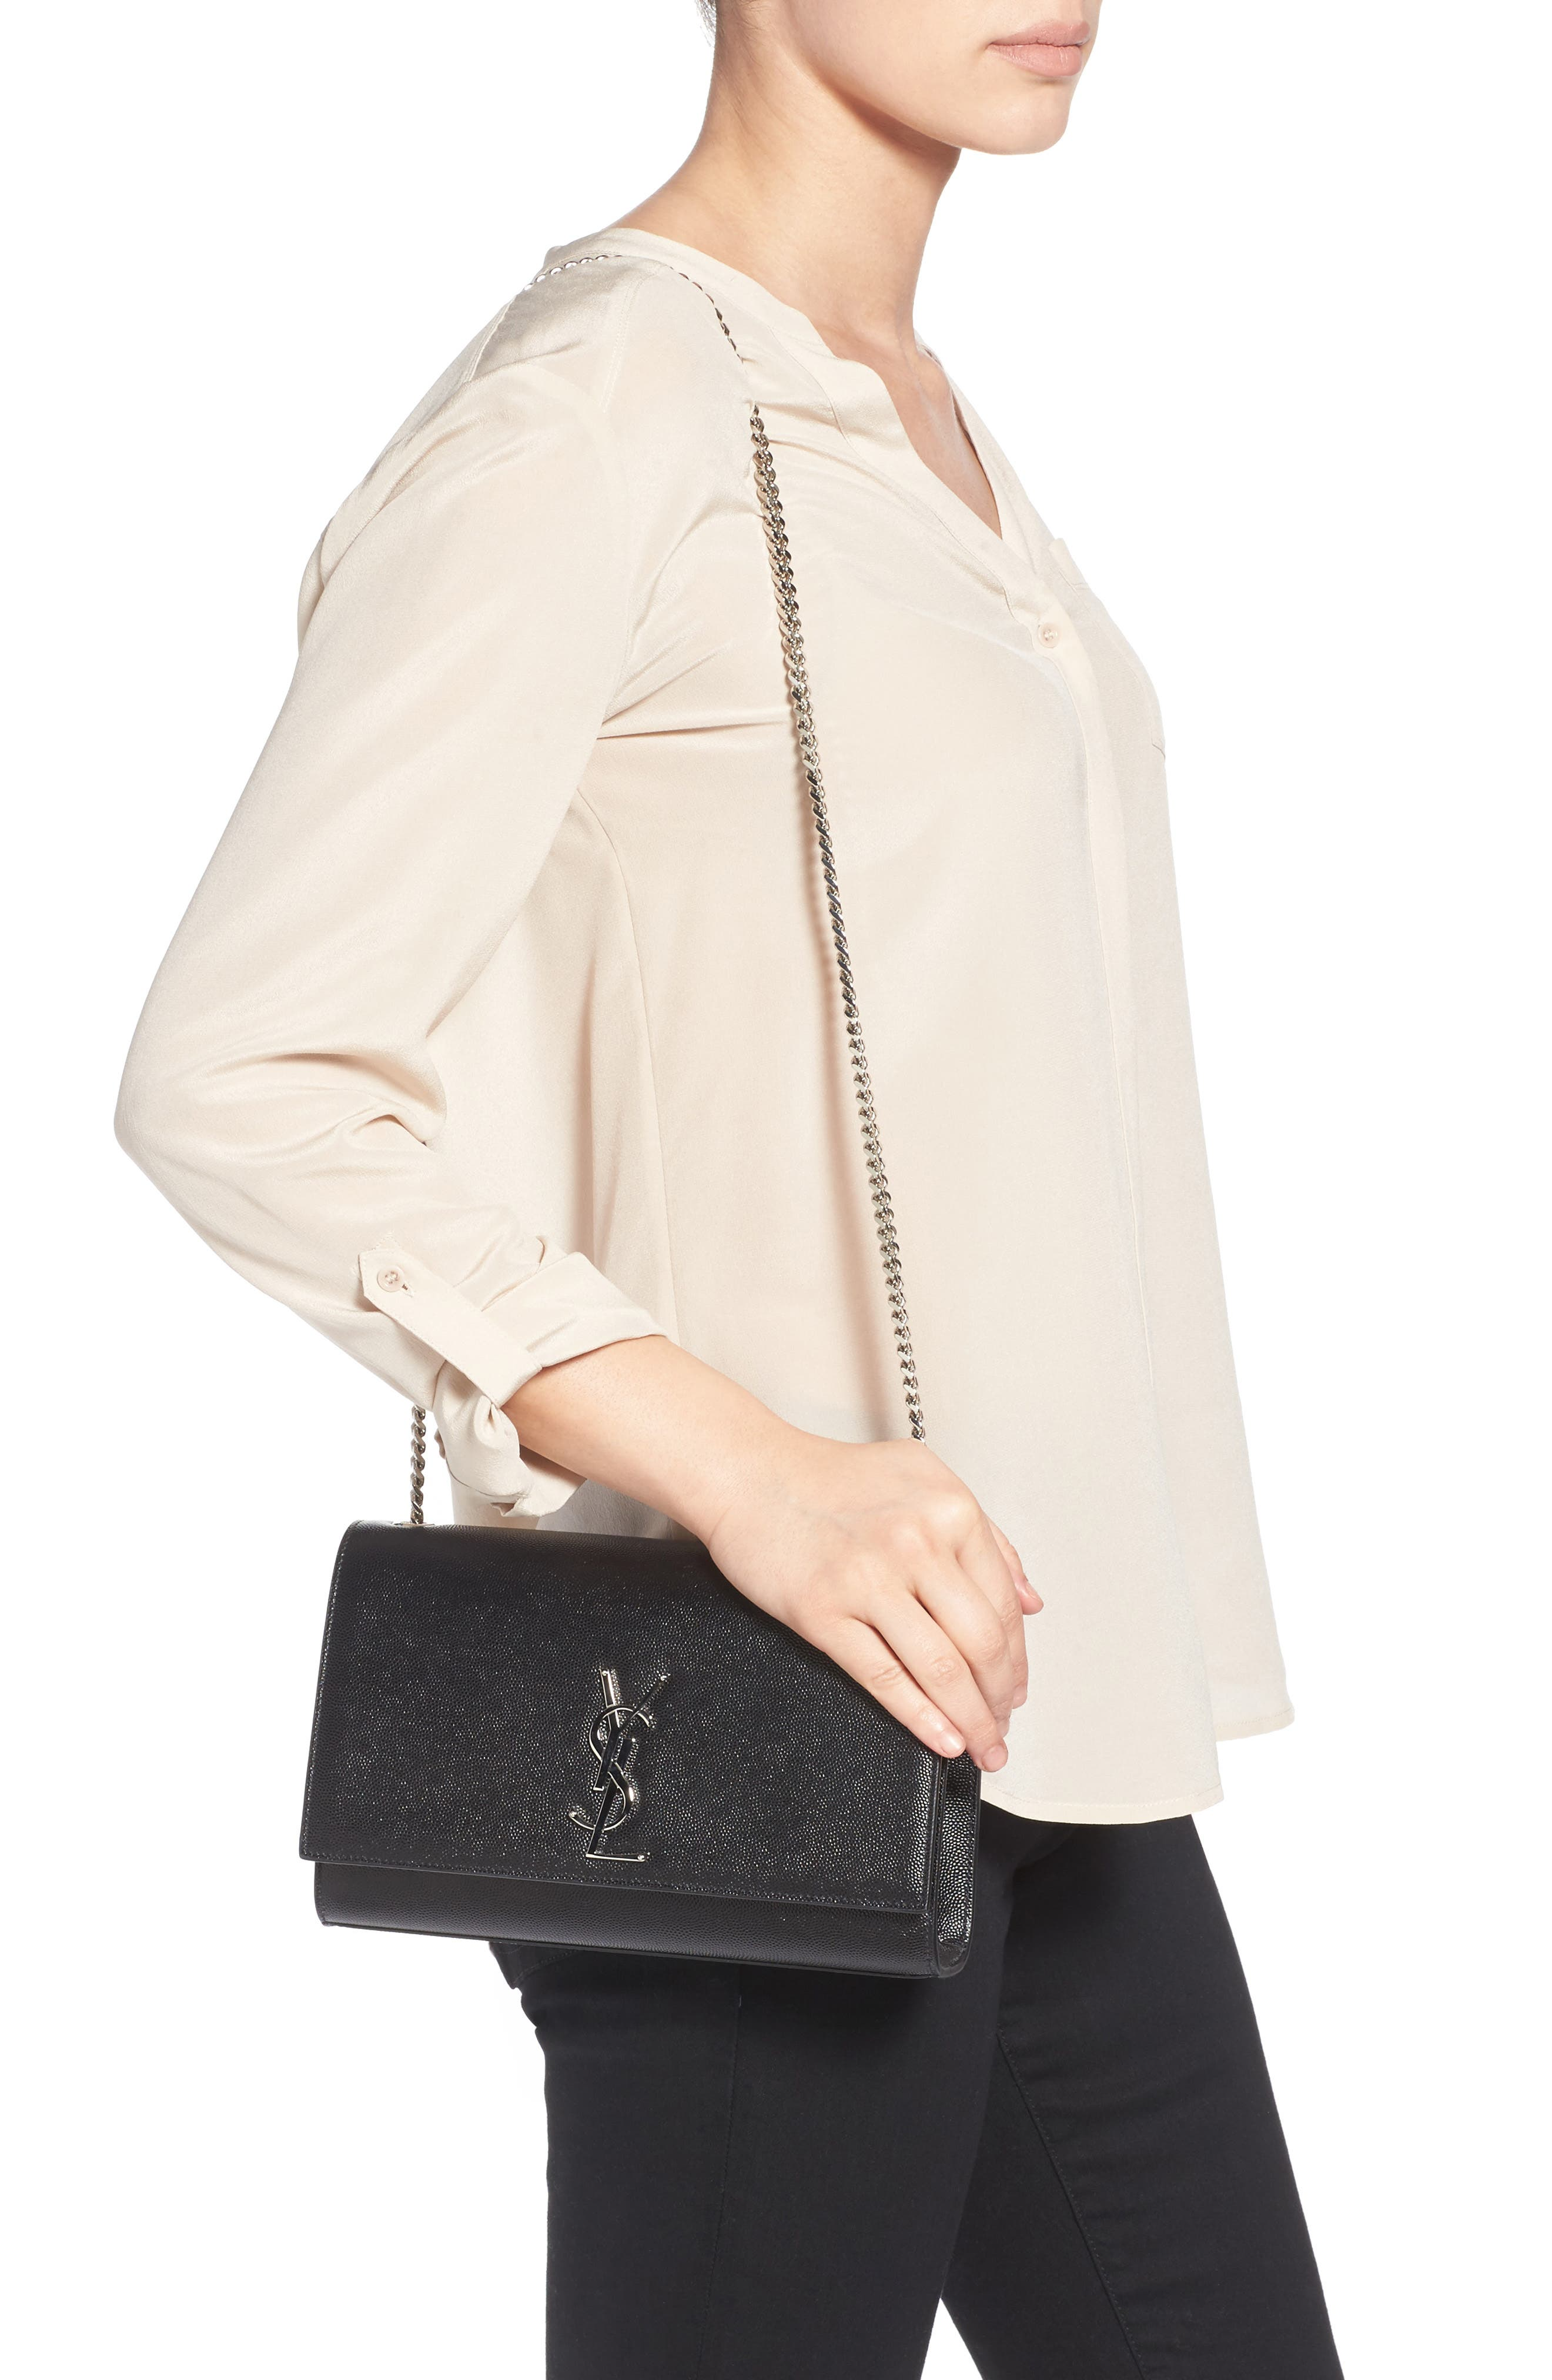 SAINT LAURENT, Medium Kate Calfskin Leather Shoulder Bag, Alternate thumbnail 2, color, NERO